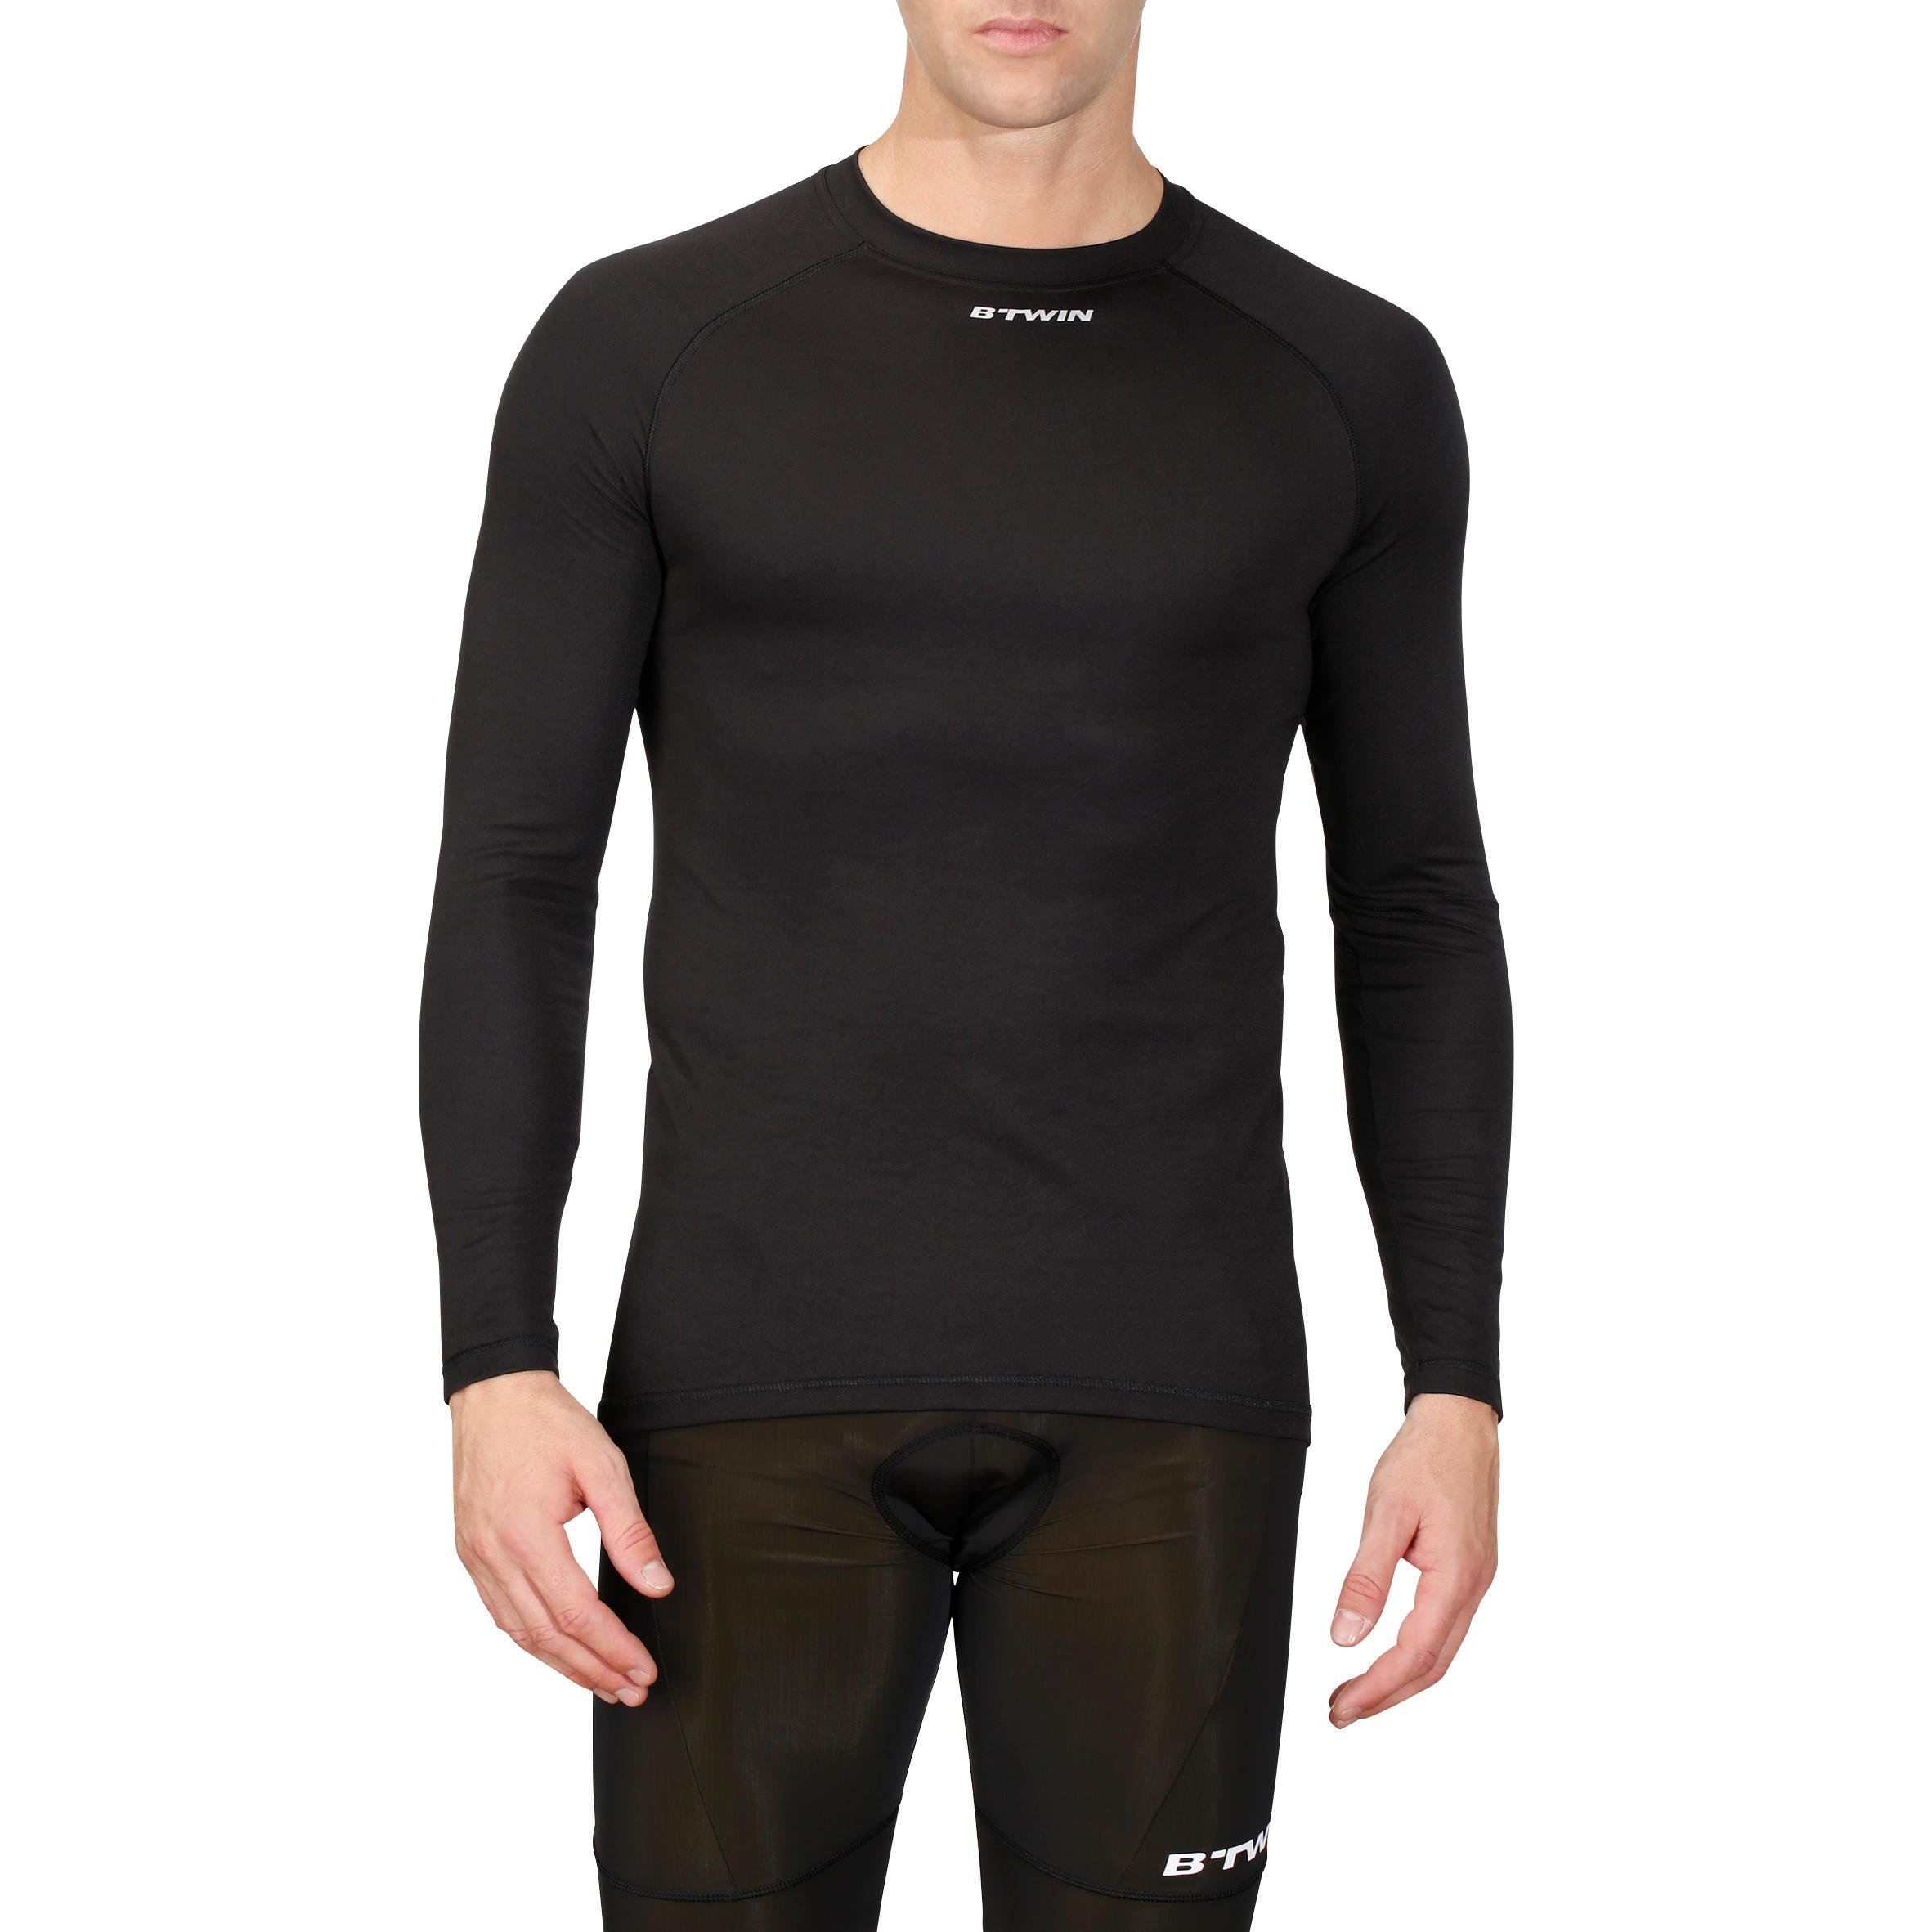 100 Cycling Long-Sleeved Base Layer - Black